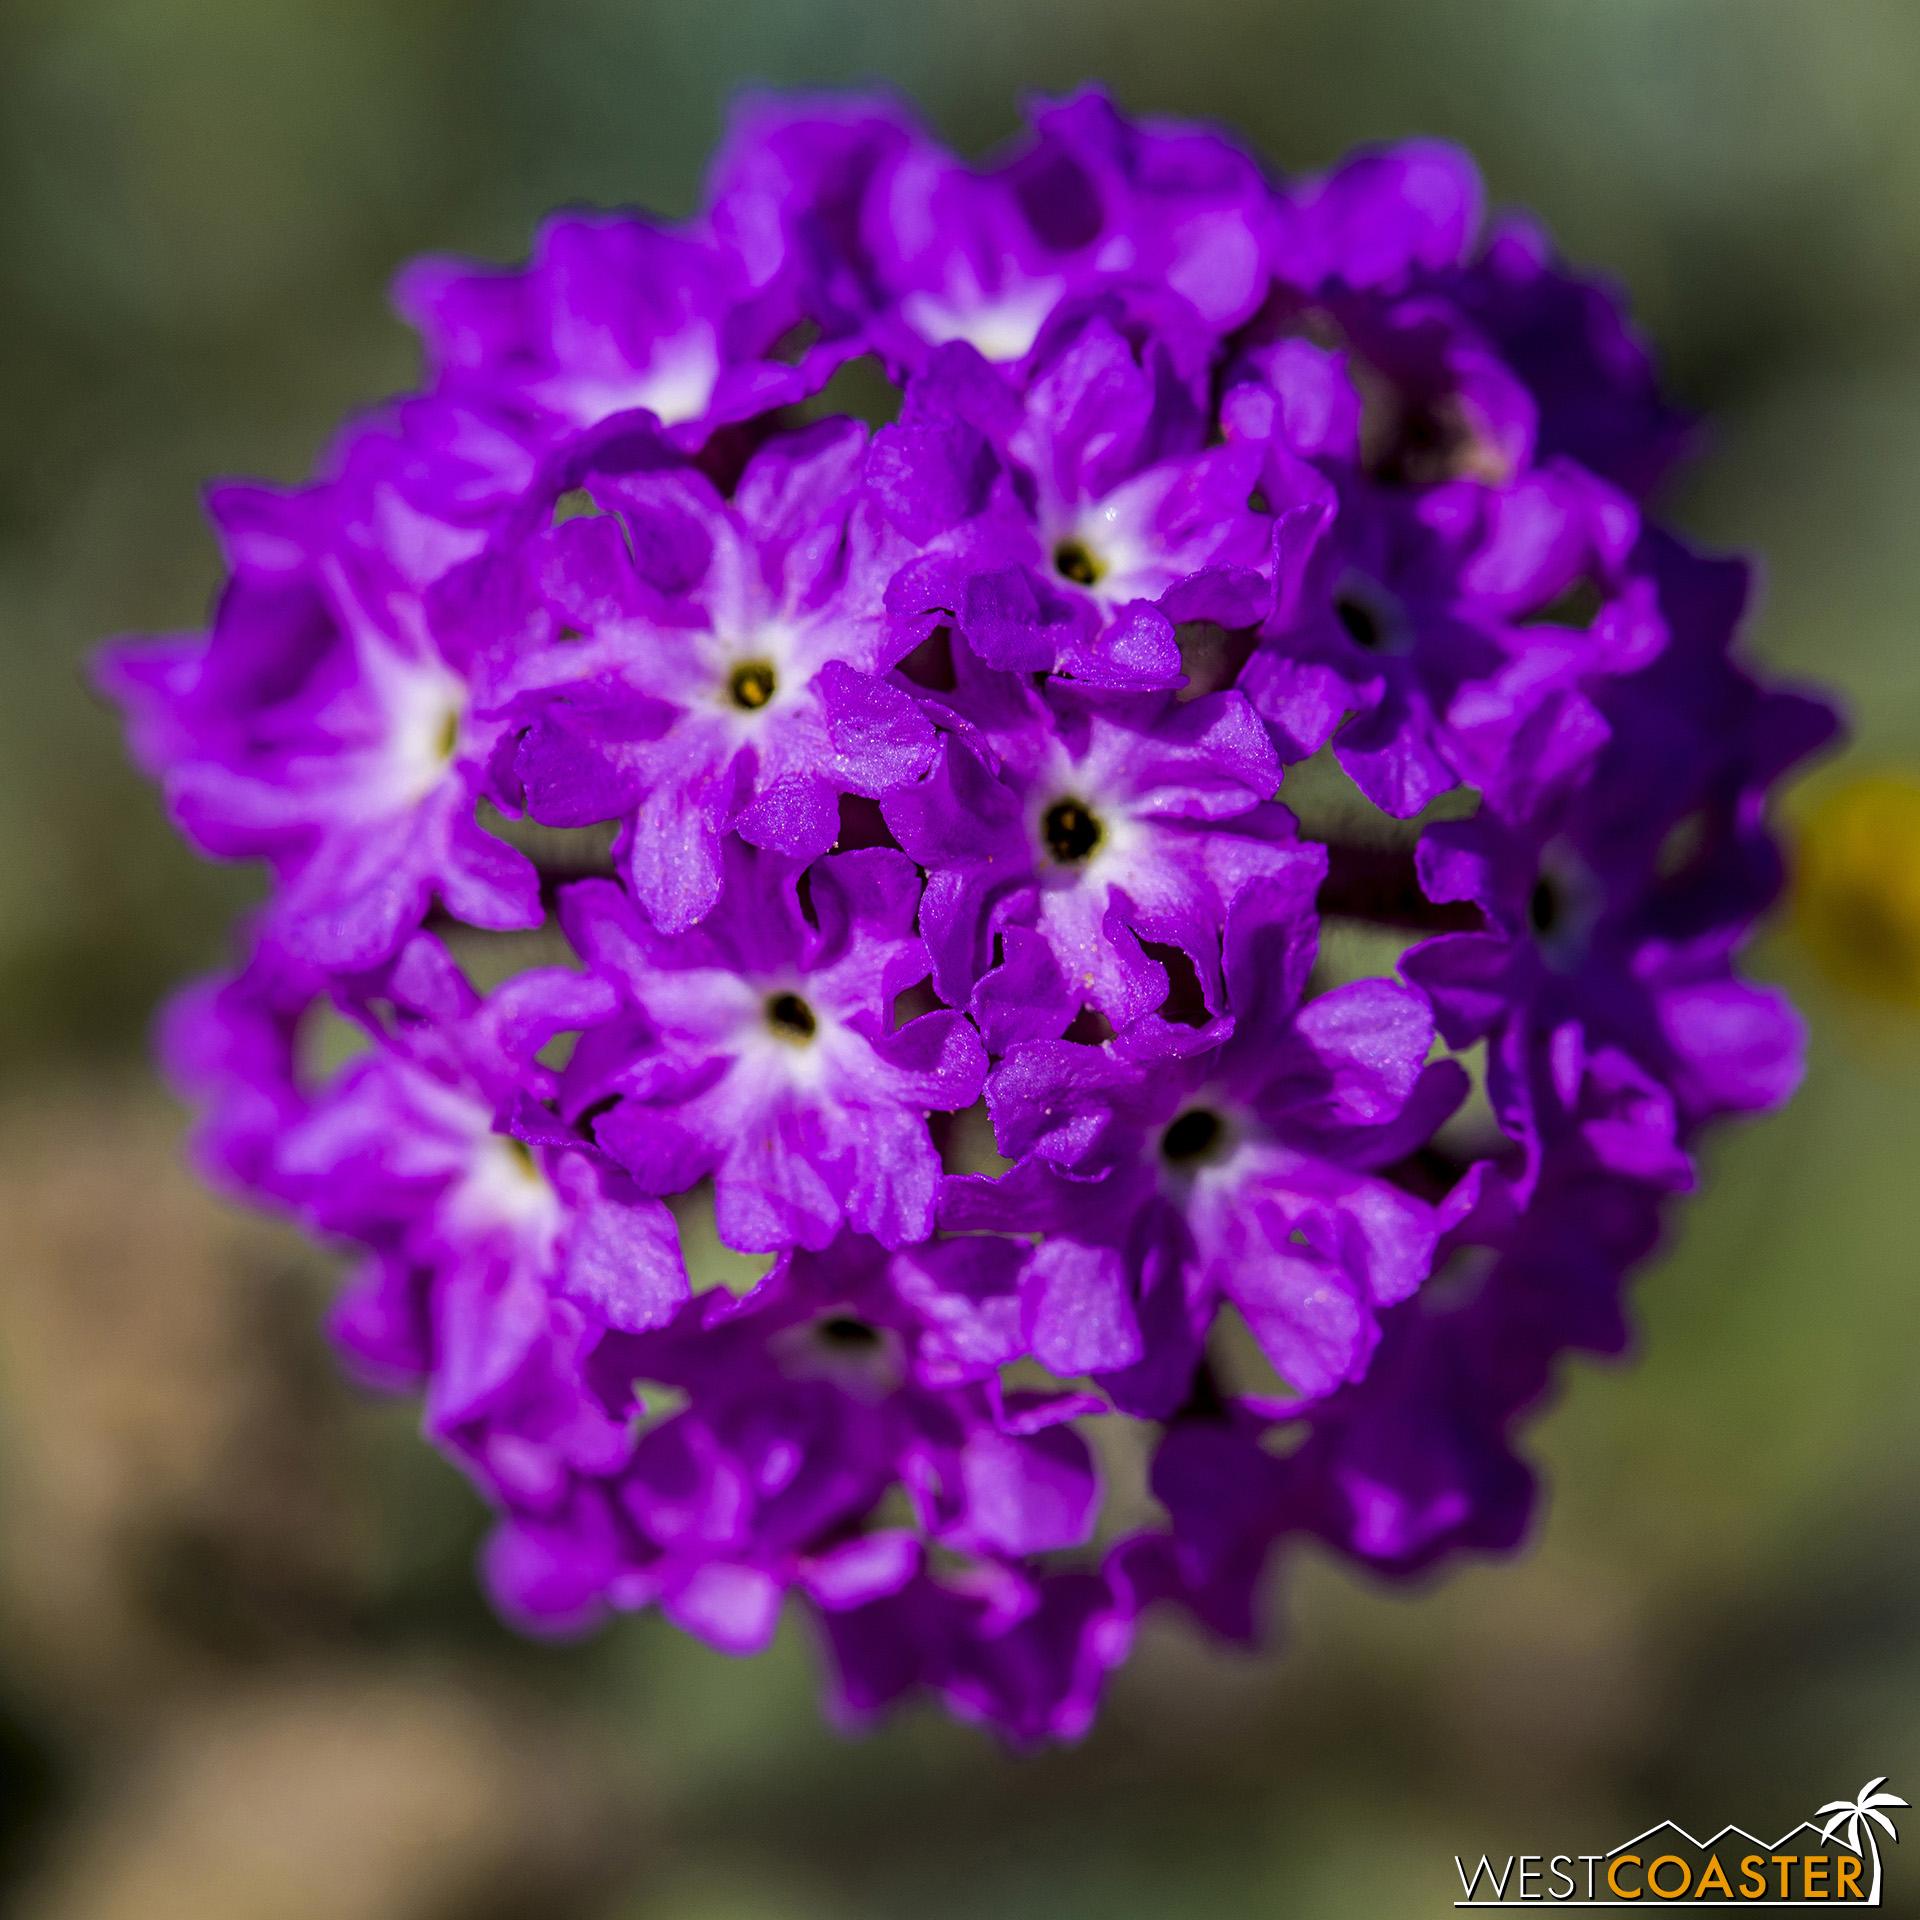 Desert sand verbena provide some great brushes of purplish pinks.